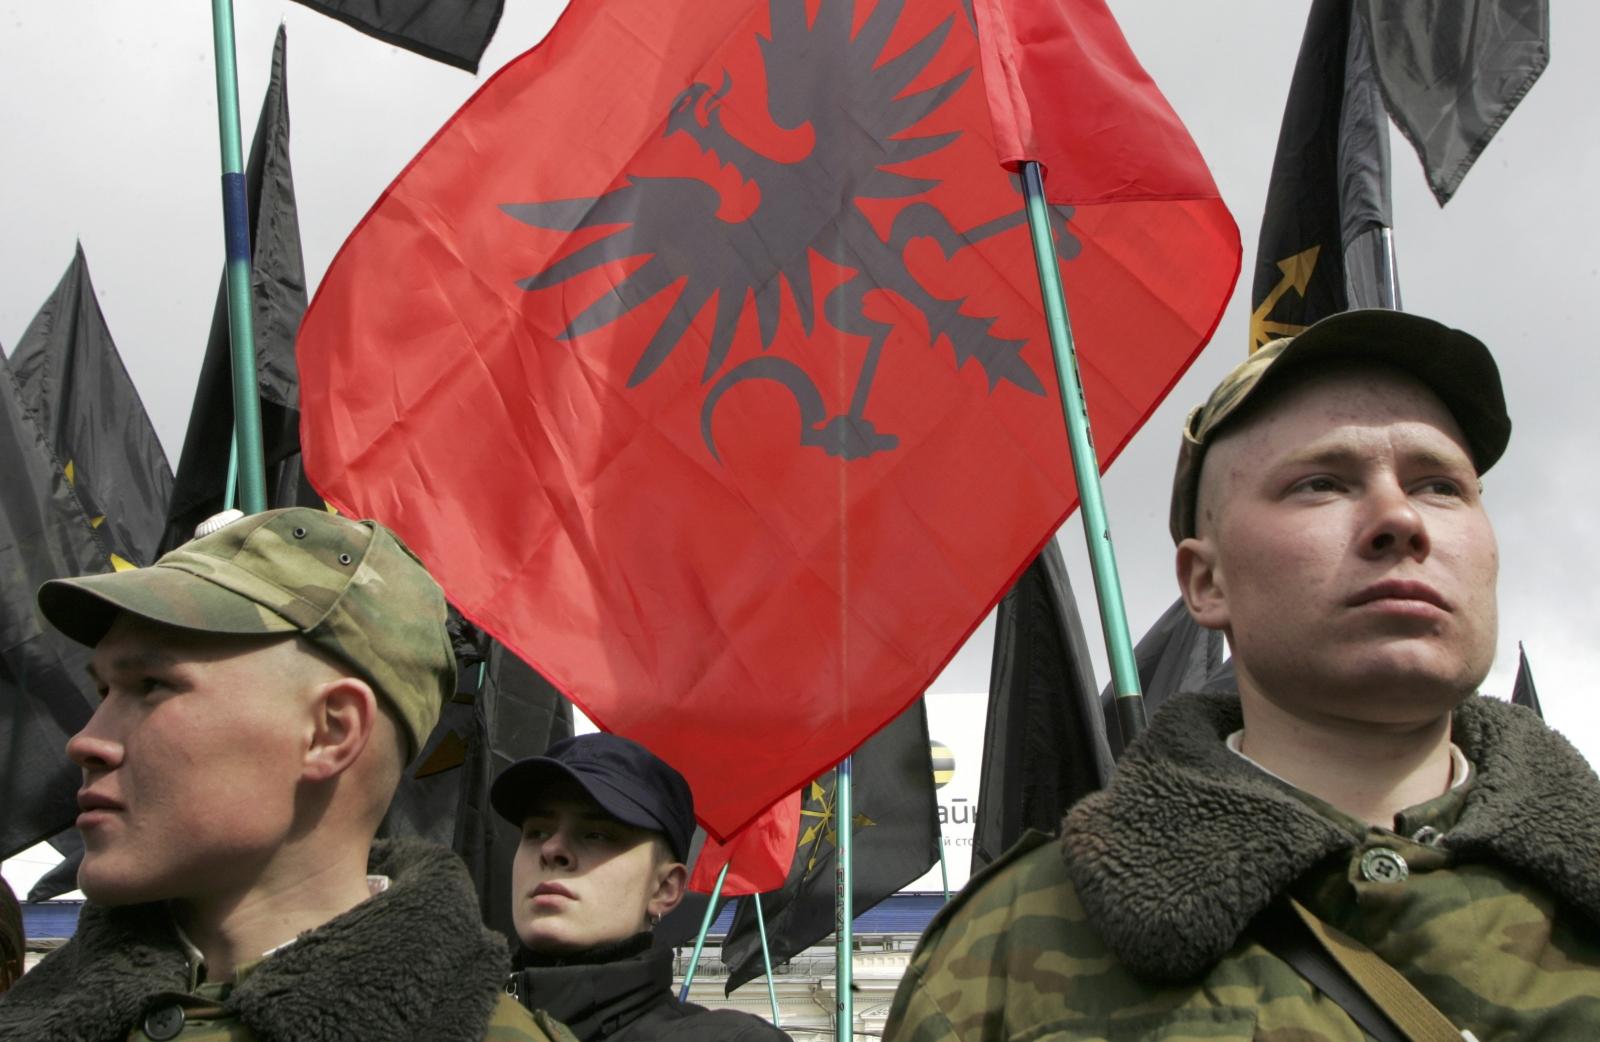 Eurasian Youth Movement rally